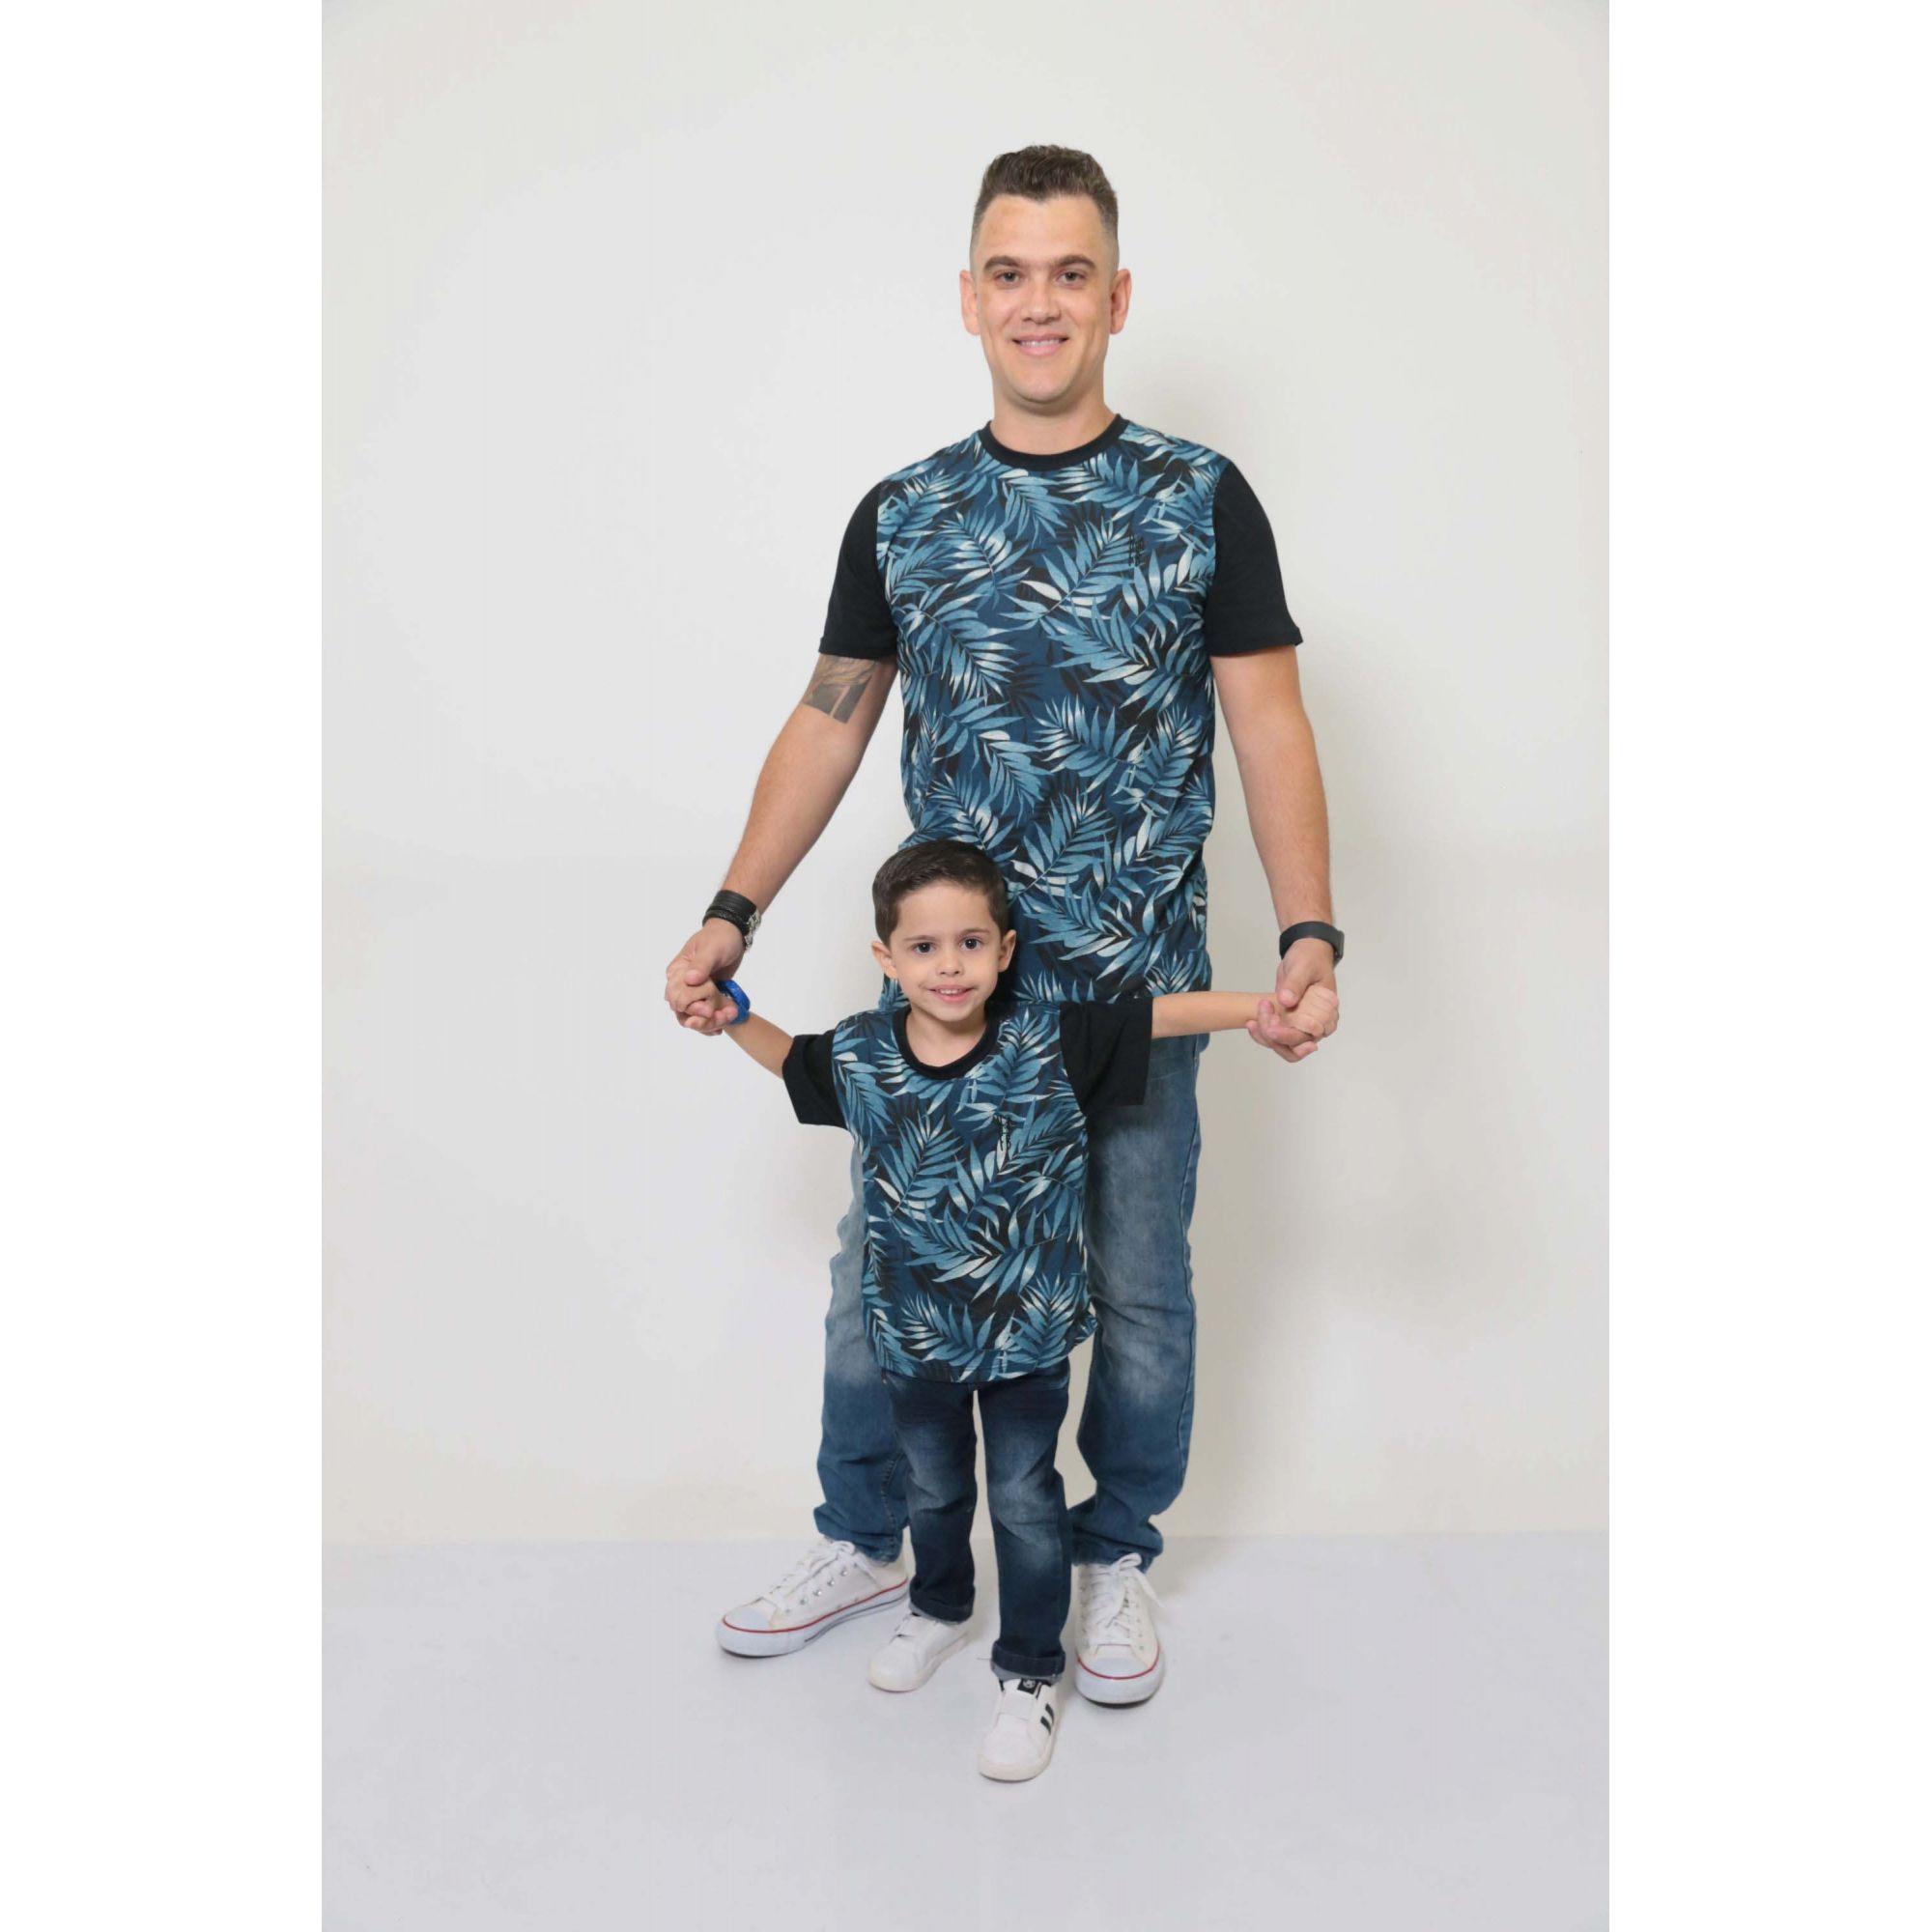 PAI E FILHO > 02 T-Shirts - Tropical  [Coleção Tal Pai Tal Filho]  - Heitor Fashion Brazil